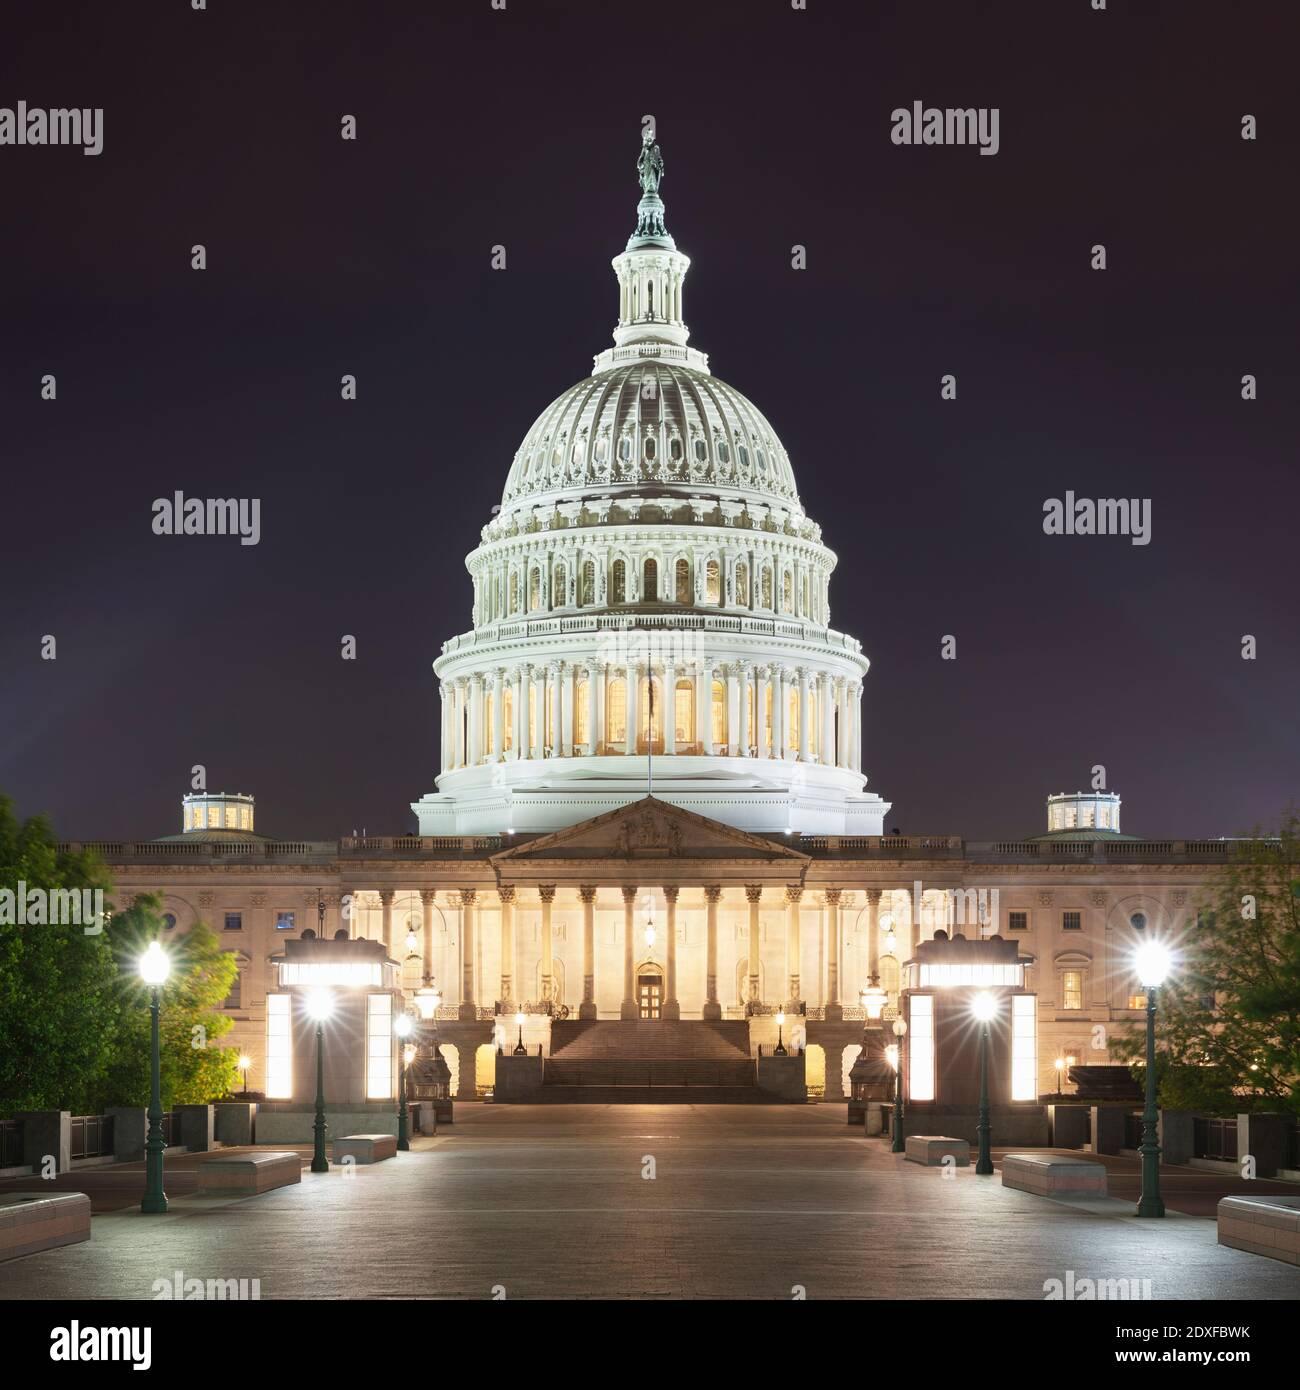 USA, Washington DC, Facade of United States Capitol at night Stock Photo